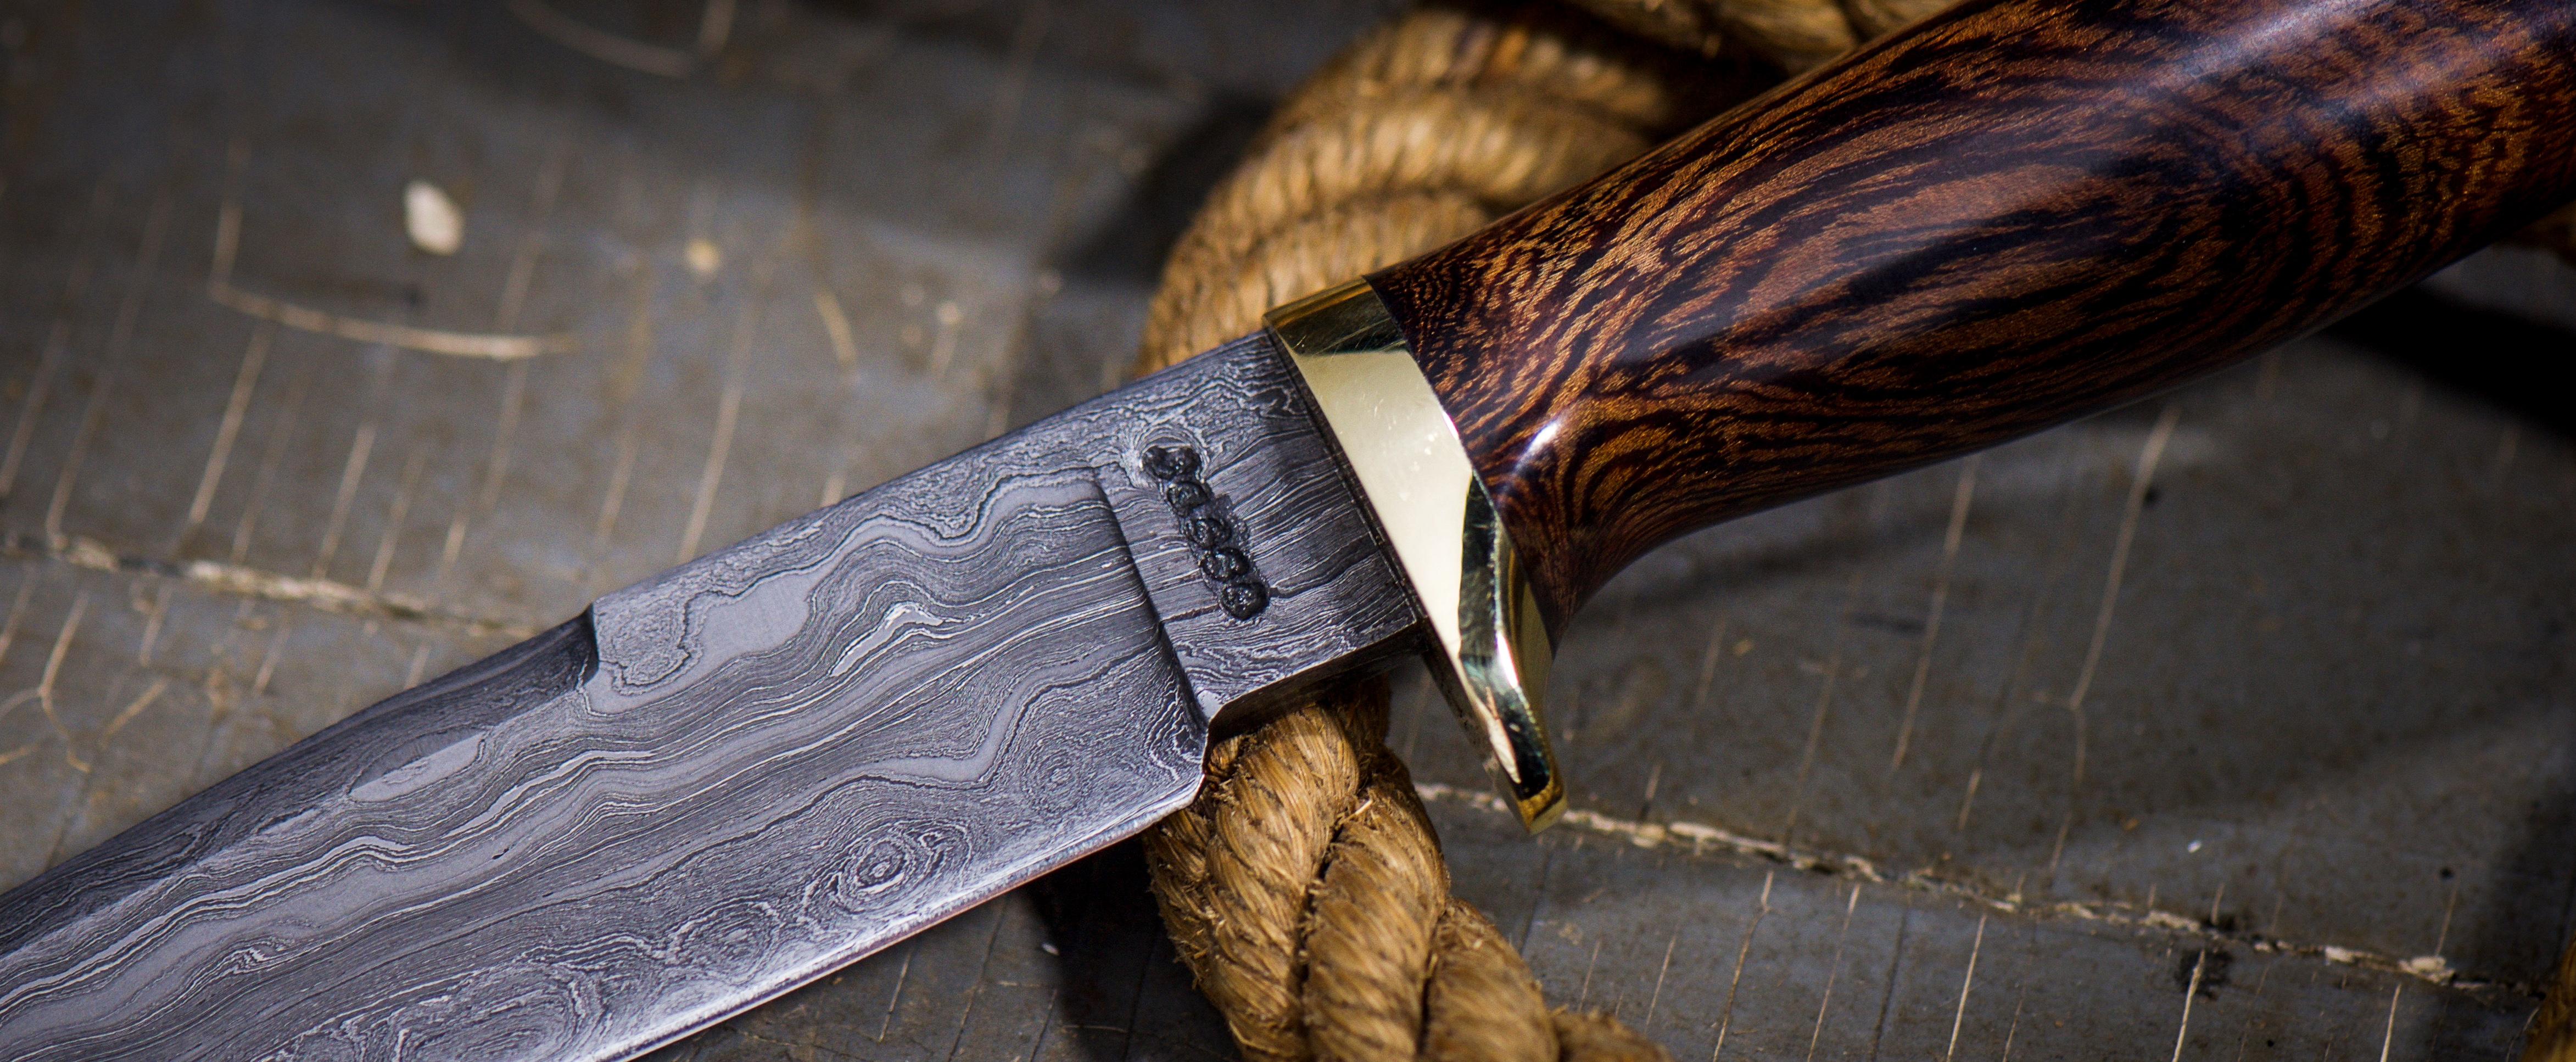 Jesse Hemphill Knives - Custom Profiles